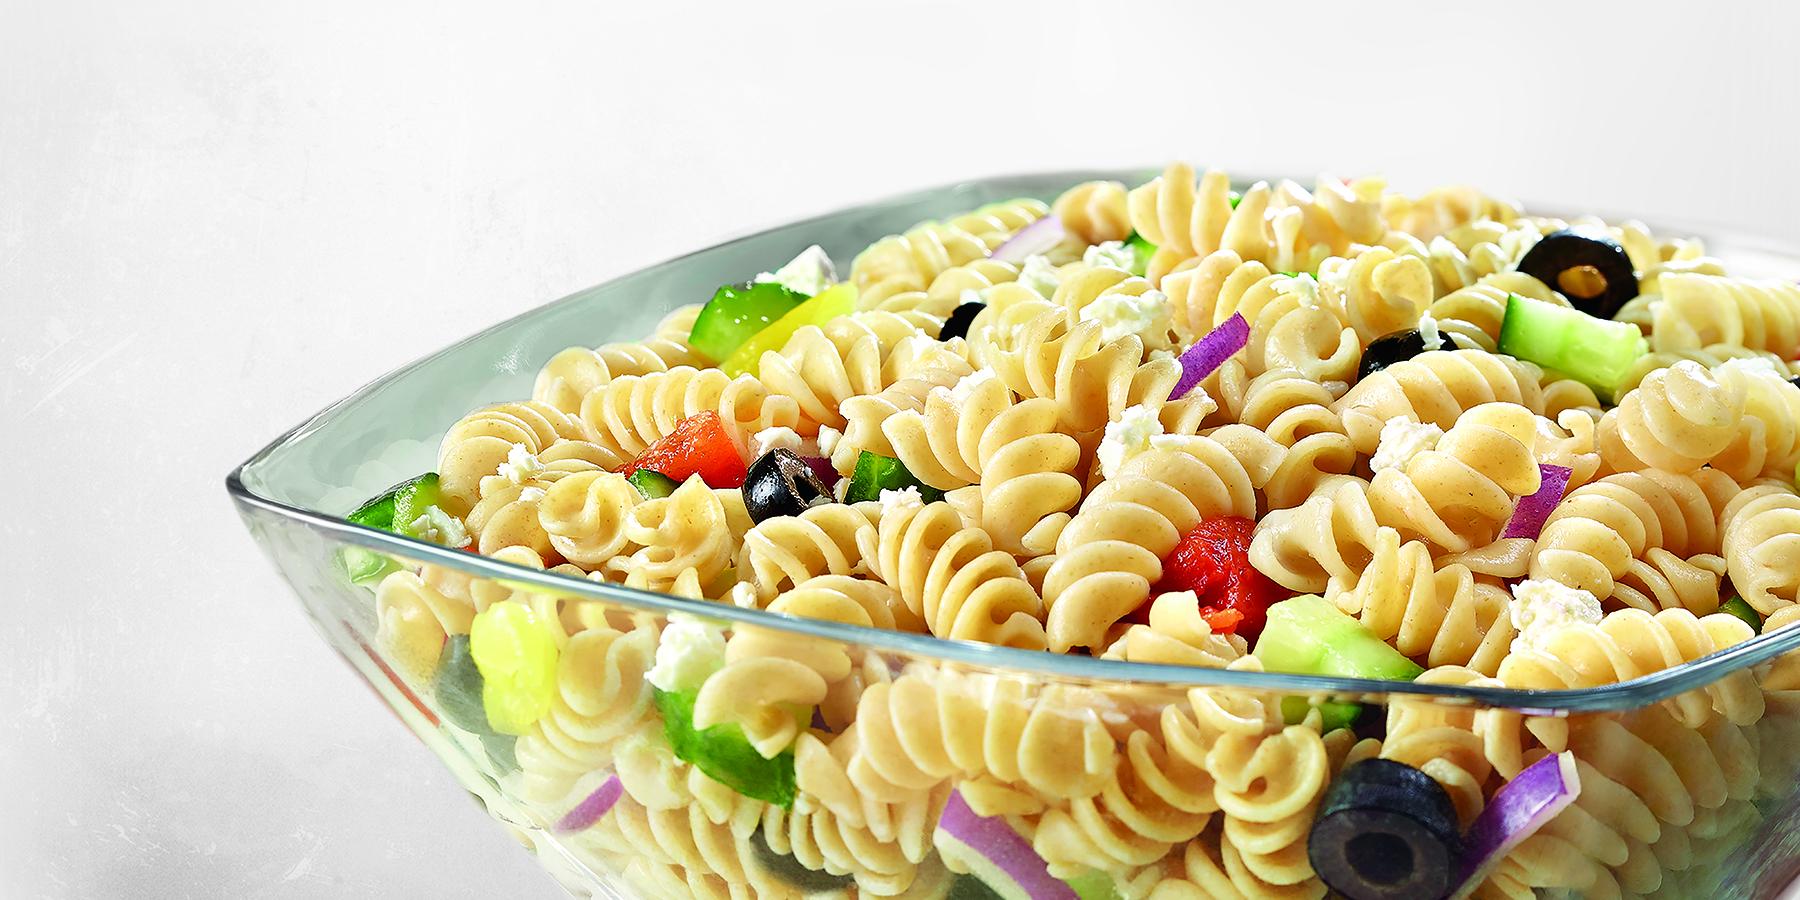 Anthony's Greek Pasta Salad with Rotini